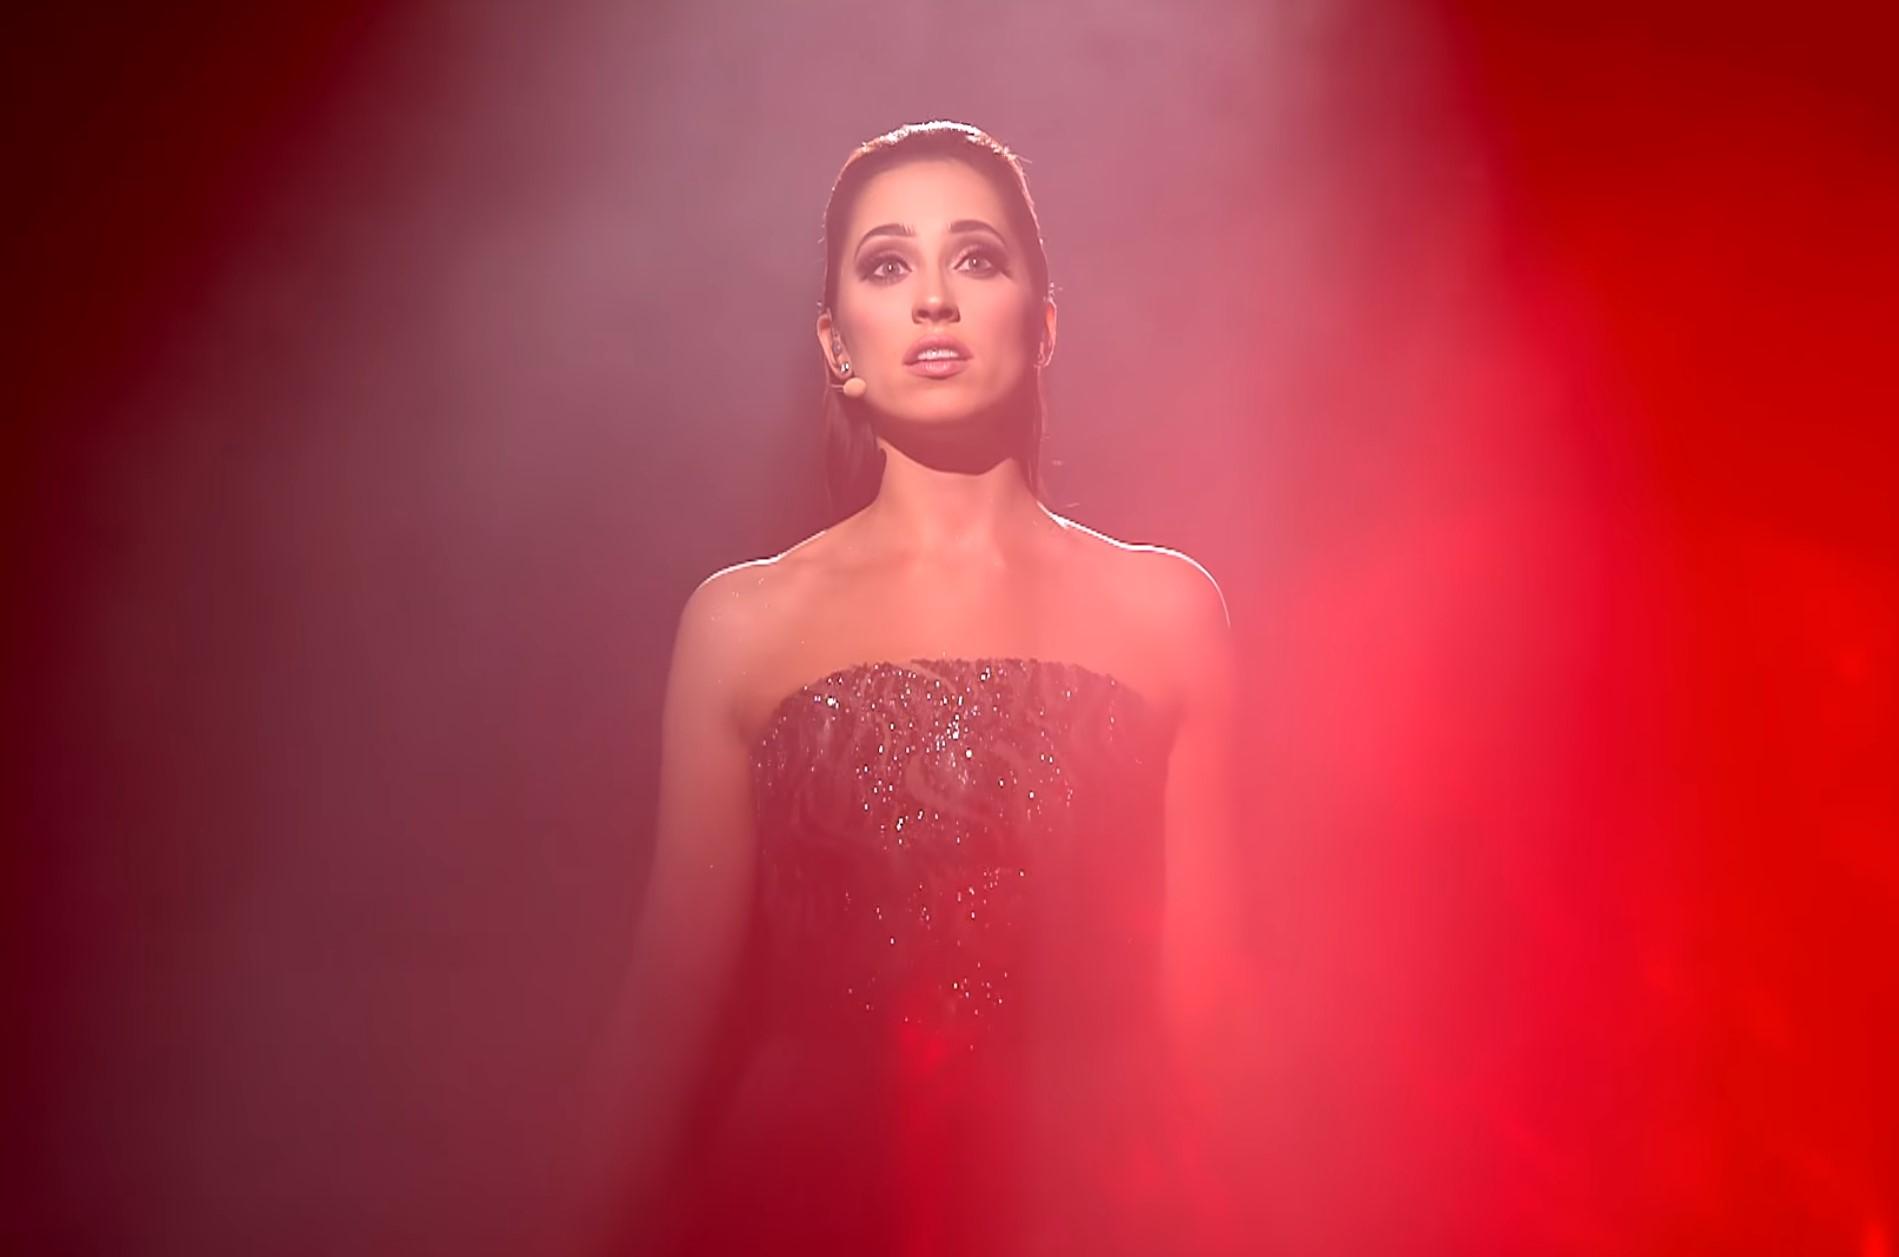 Ennustusportaal: Eurovisioonile läheb Eestit esindama Elina Nechayeva